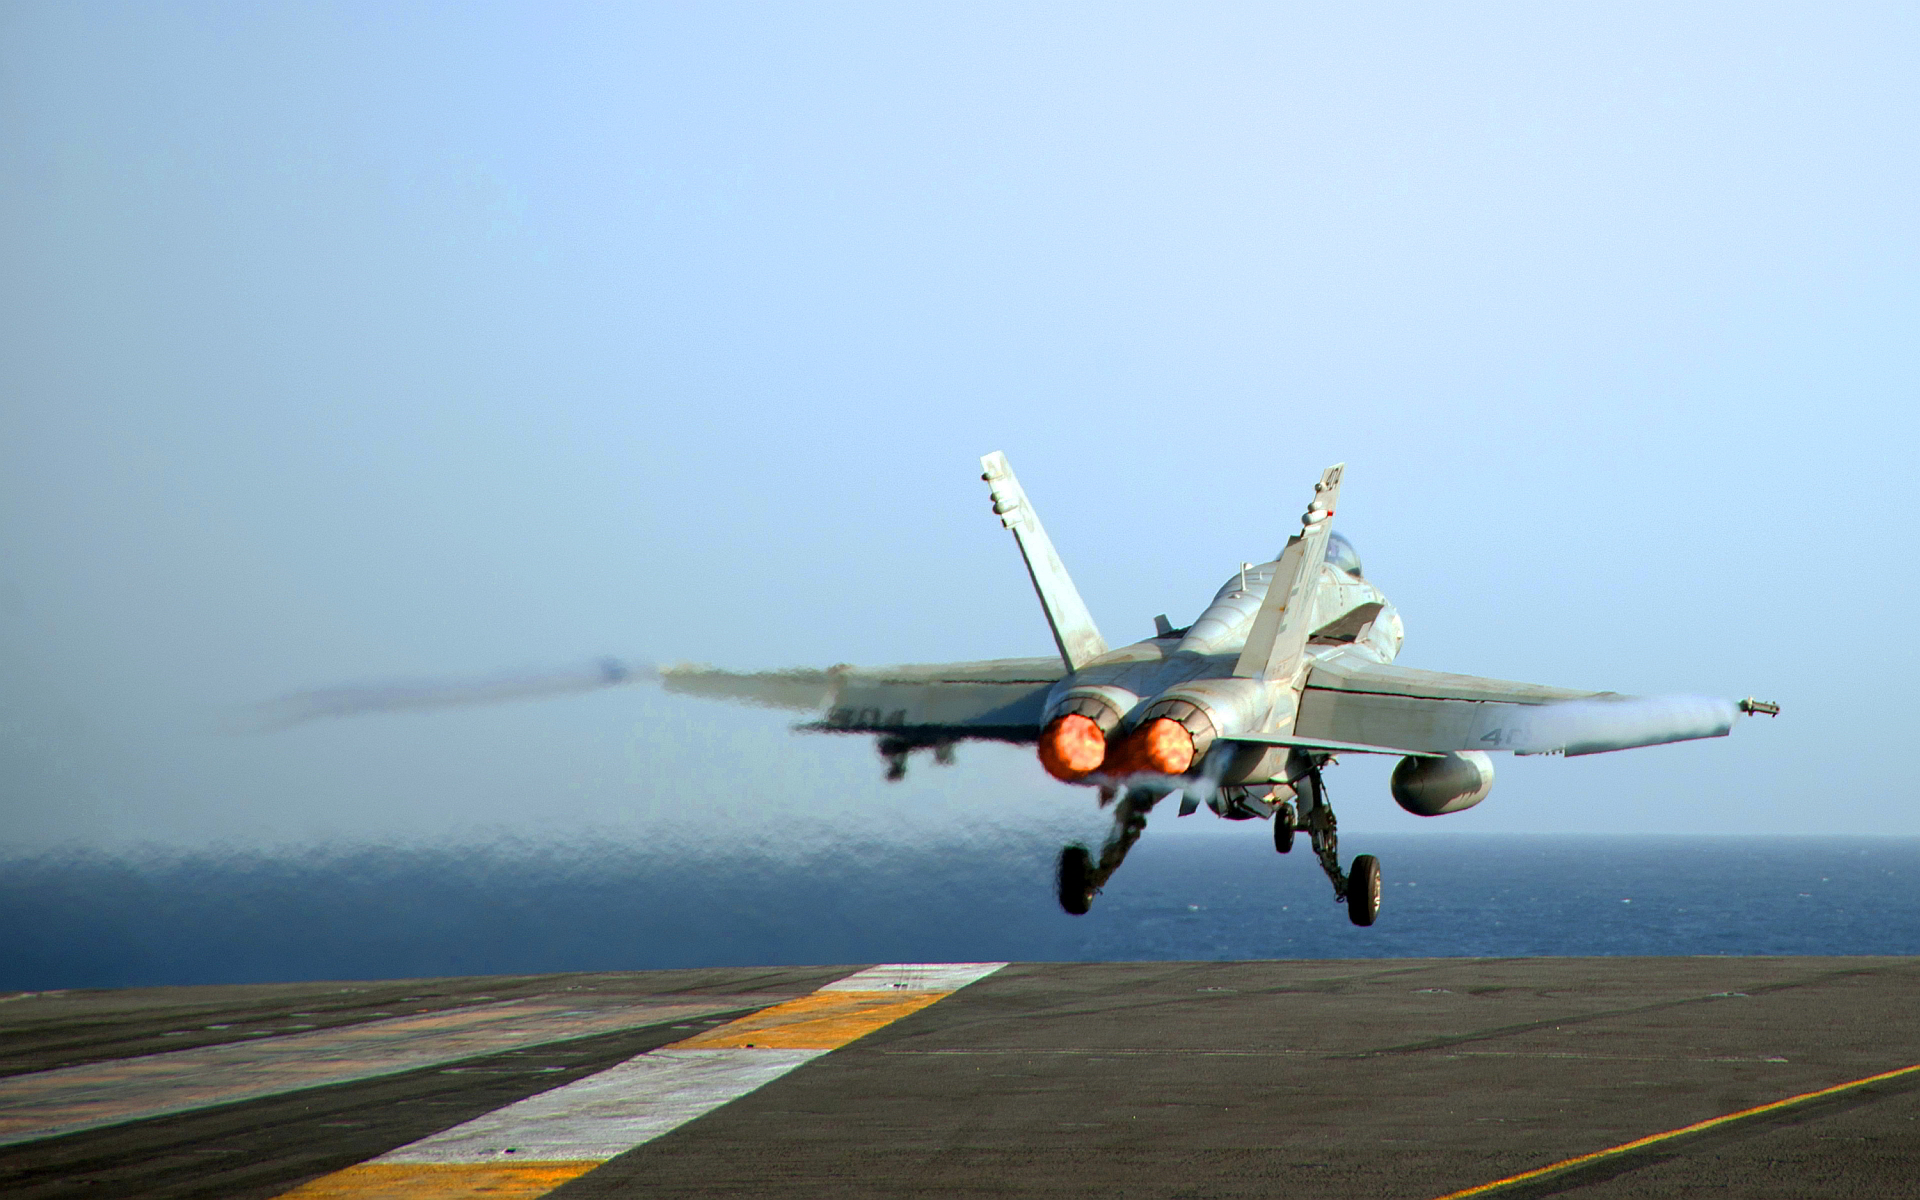 Jet aircraft carrier takeoff